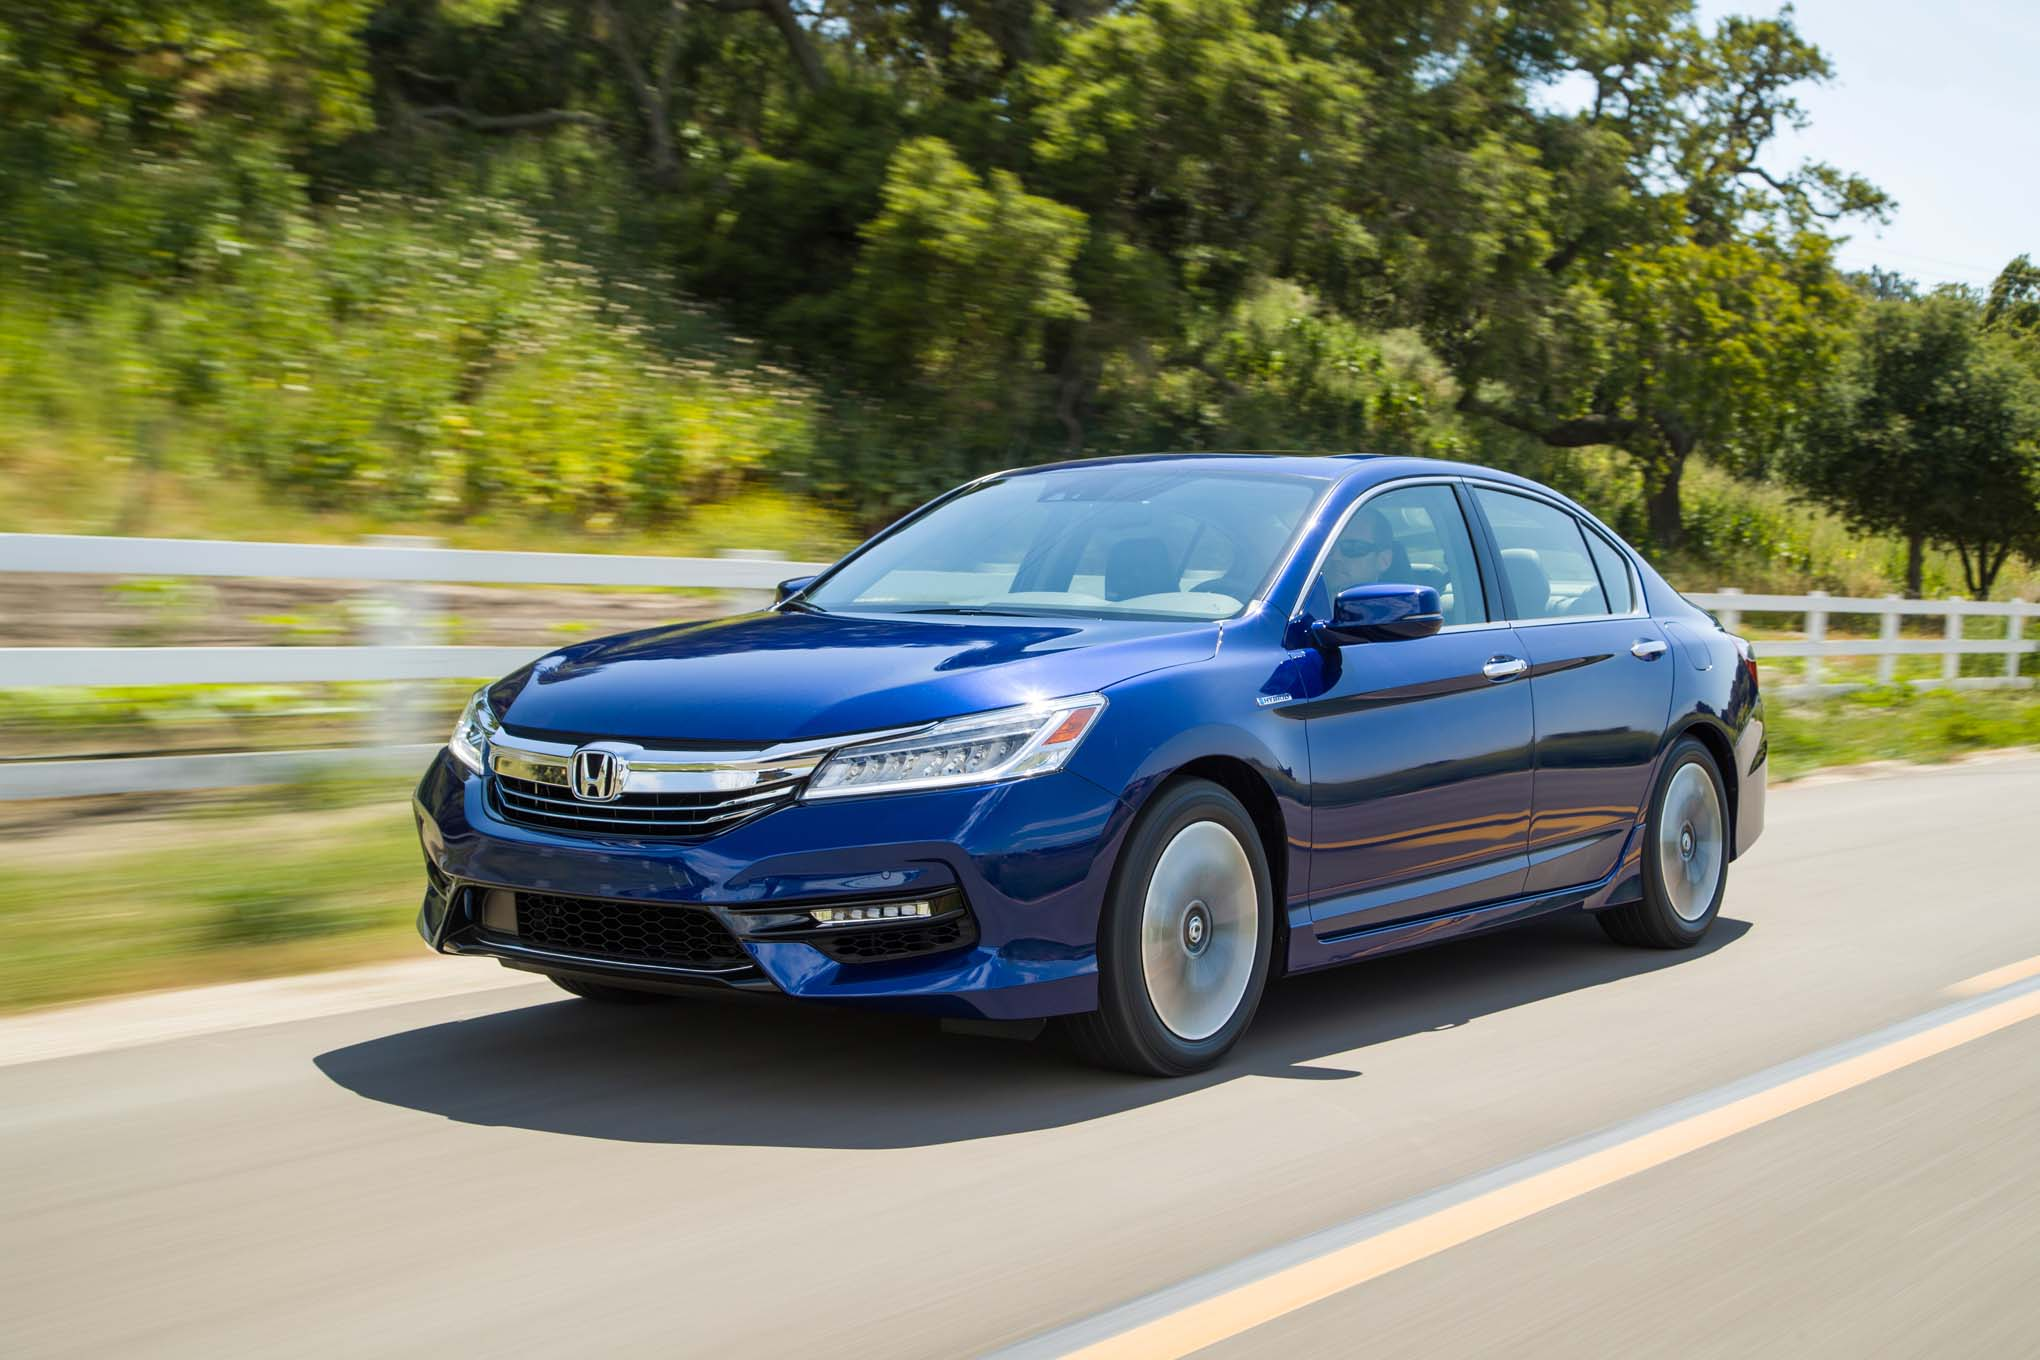 2017 Honda Accord Hybrid Front Three Quarter In Motion